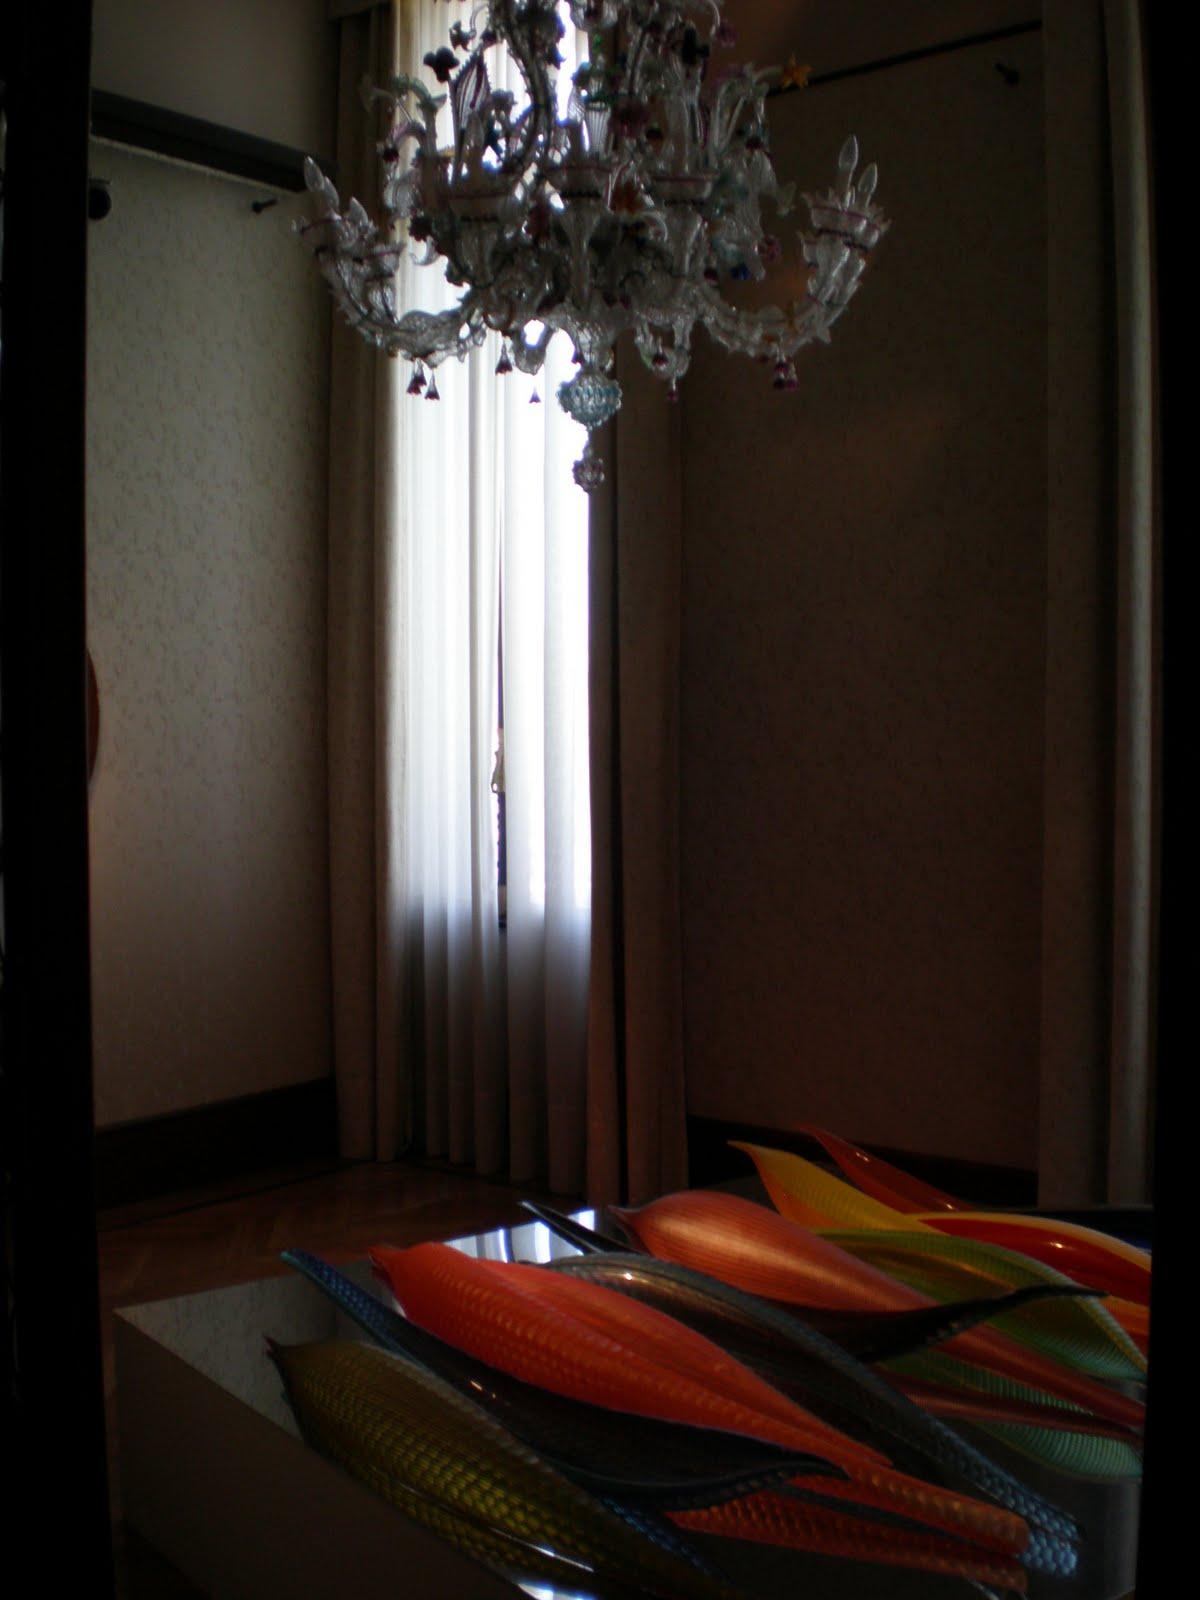 restauro lampadari antichi : Venezia: i lampadari in primo piano nobile del palazzo Cavalli ...